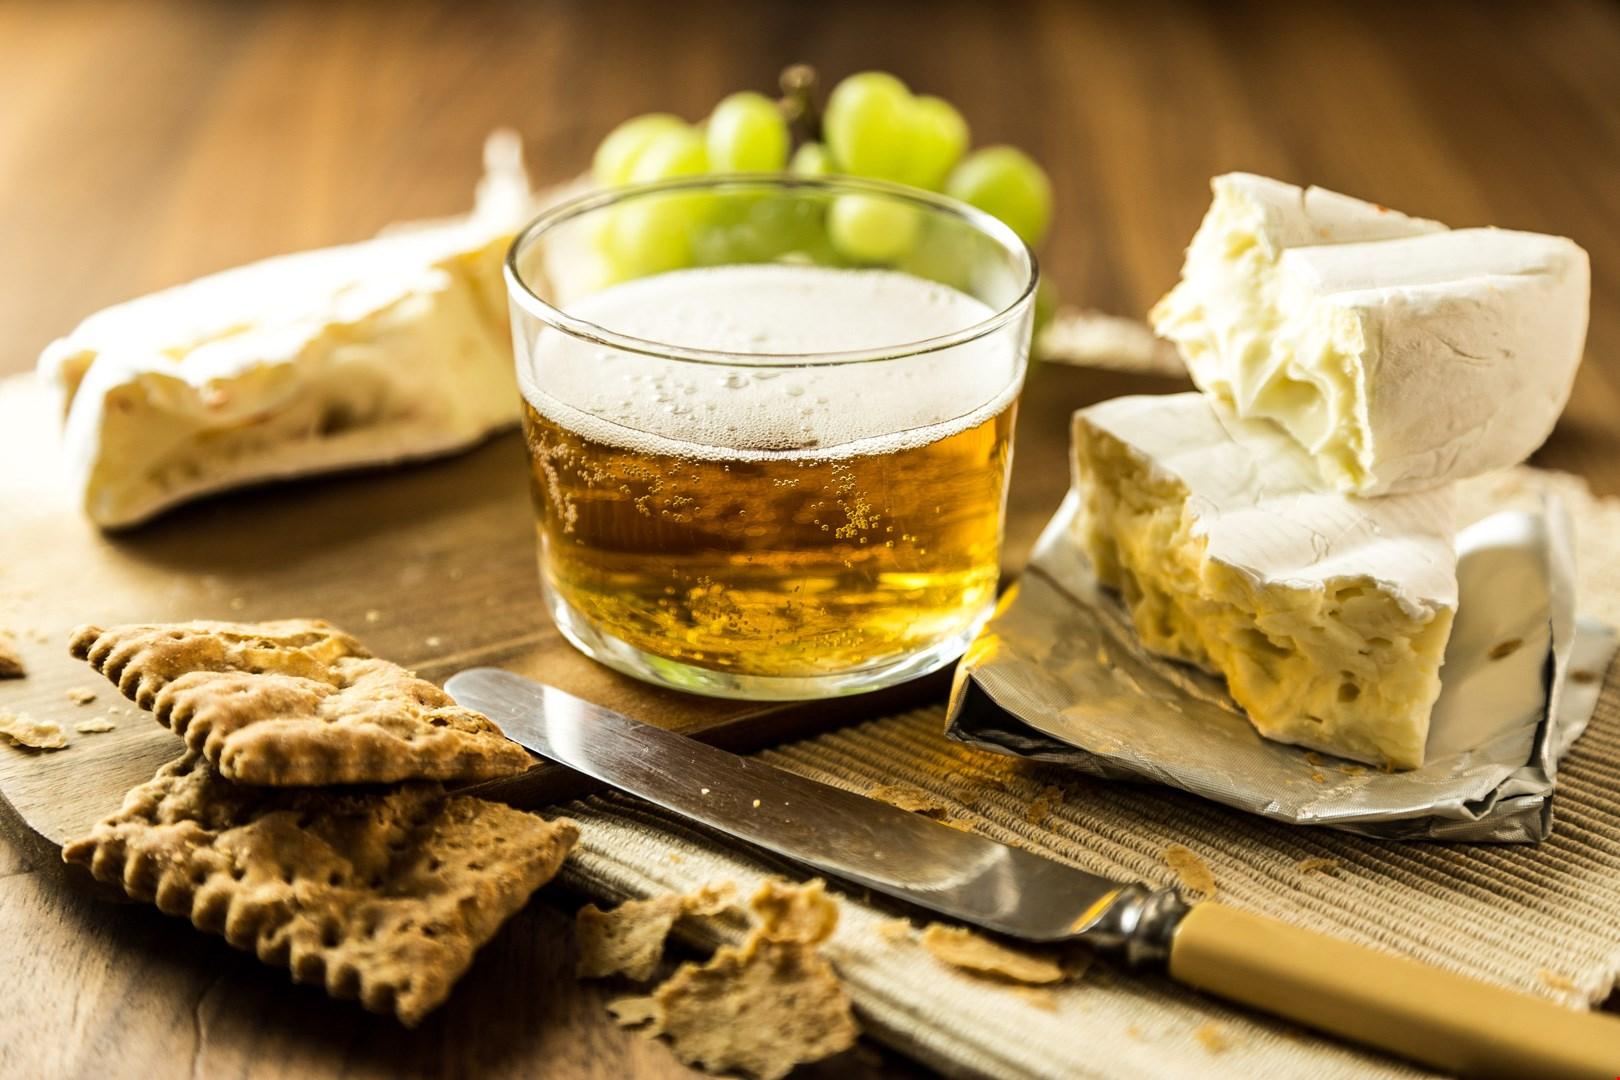 generic cheese and beer pairing chart marcella the cheesemonger rh marcellathecheesemonger com cheese berlin 2019 cheese beer dip